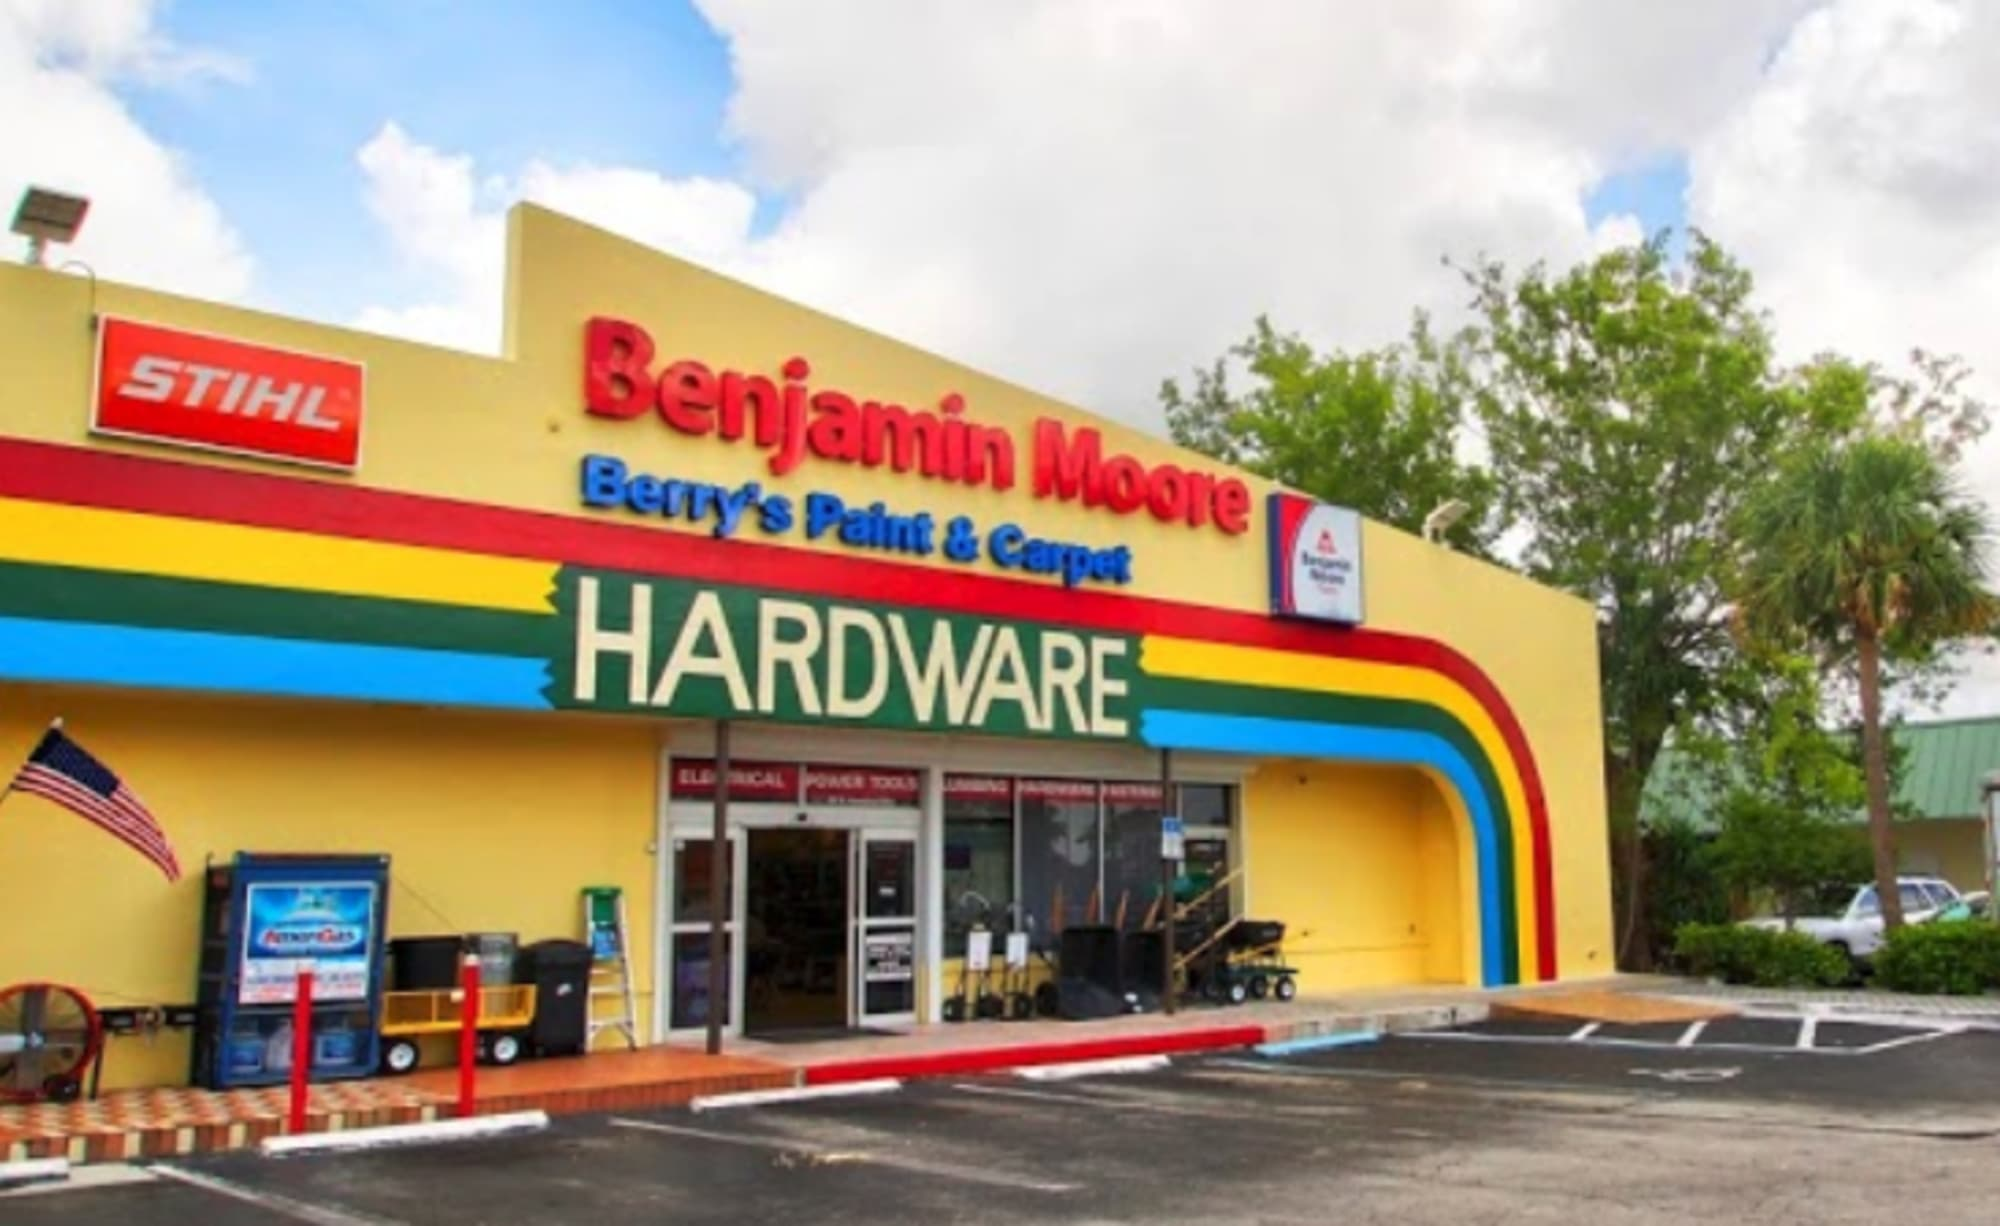 Berry's Paint, Hardware & Flooring - 896 N Homestead Blvd Homestead, FL 33030